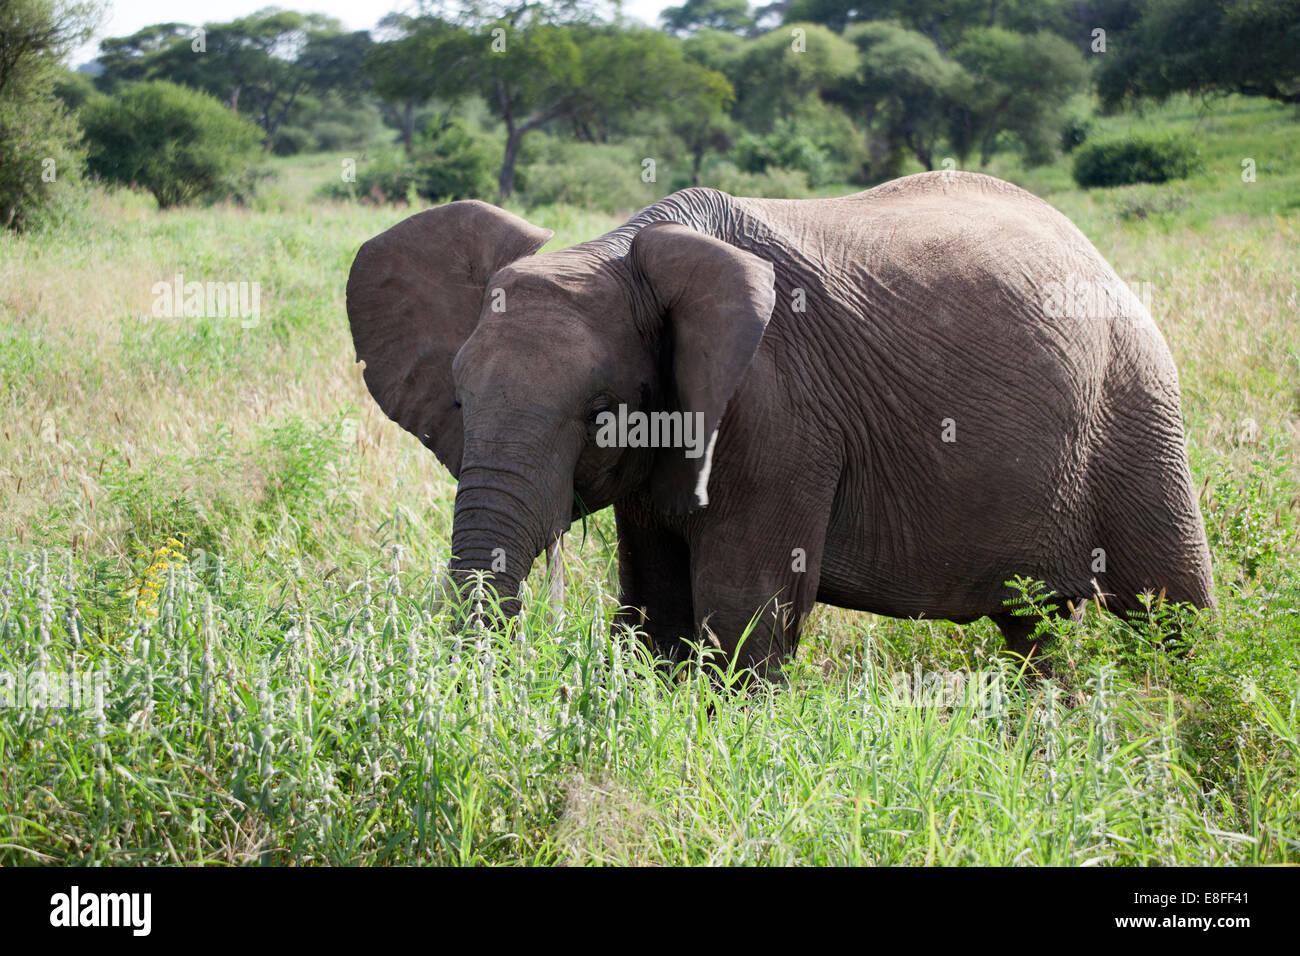 Tanzania, Young Elephant grazing - Stock Image